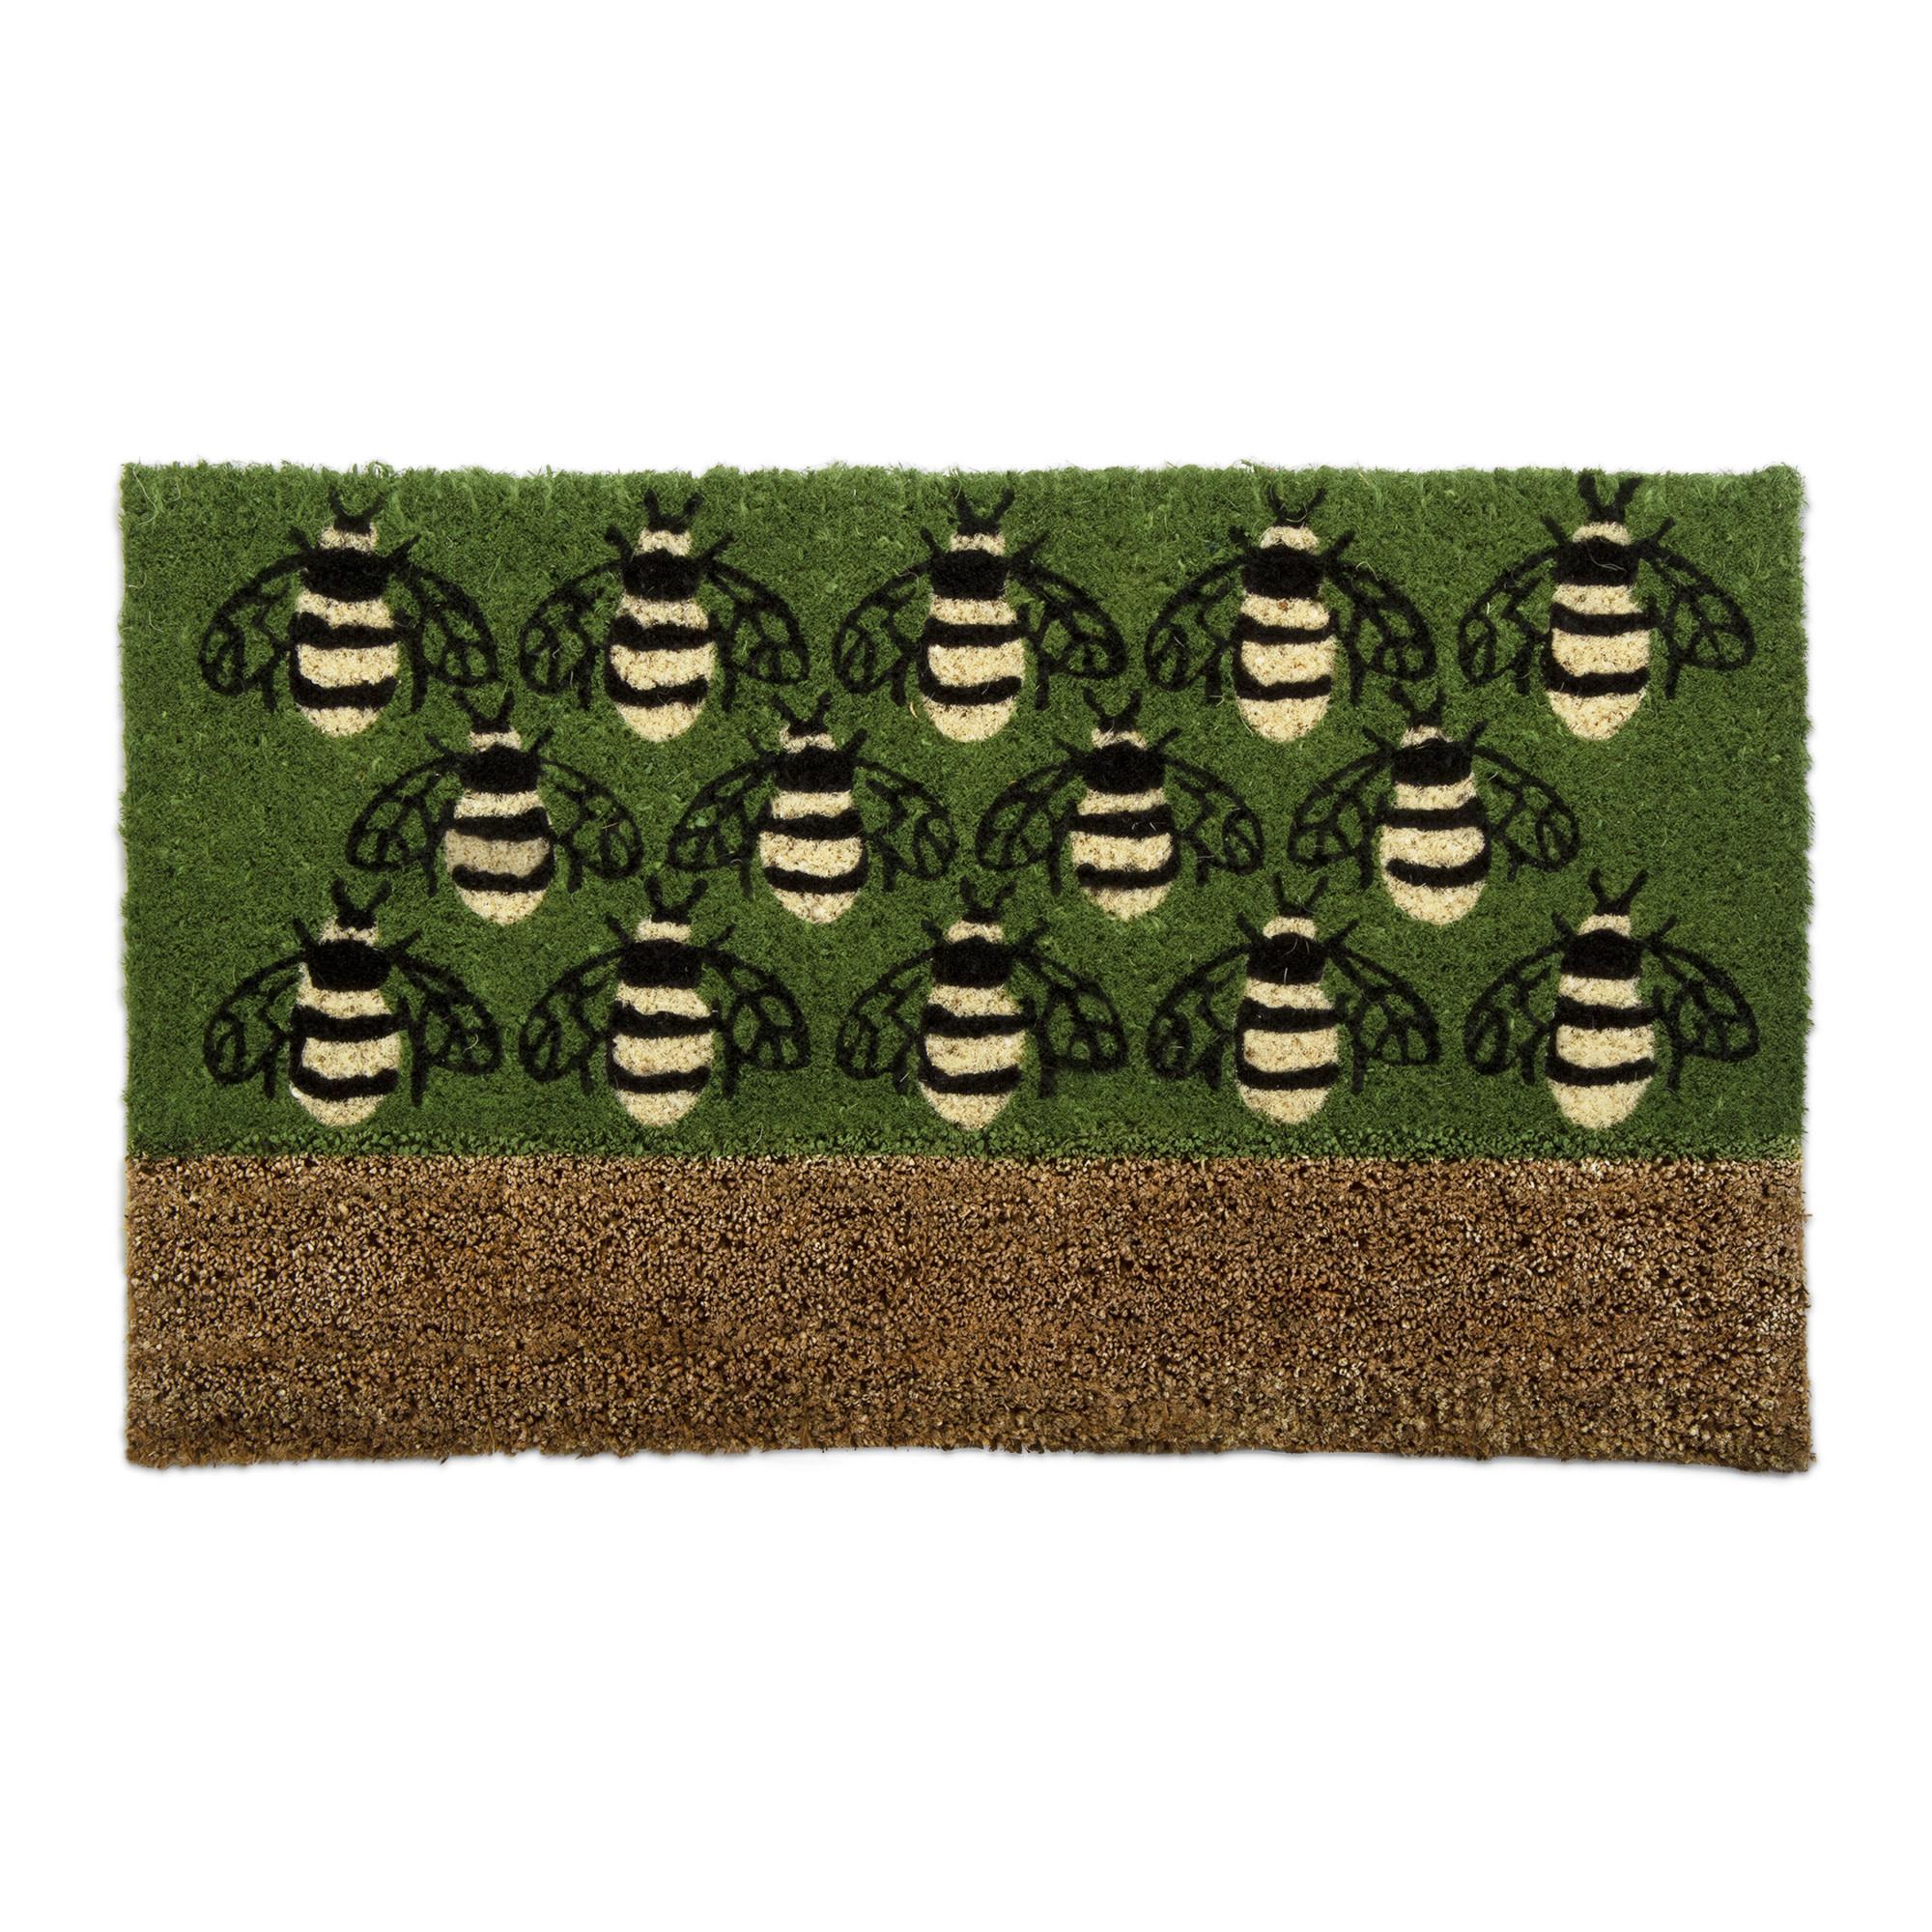 Tag Busy Bees Boot Scrape Coir Mat